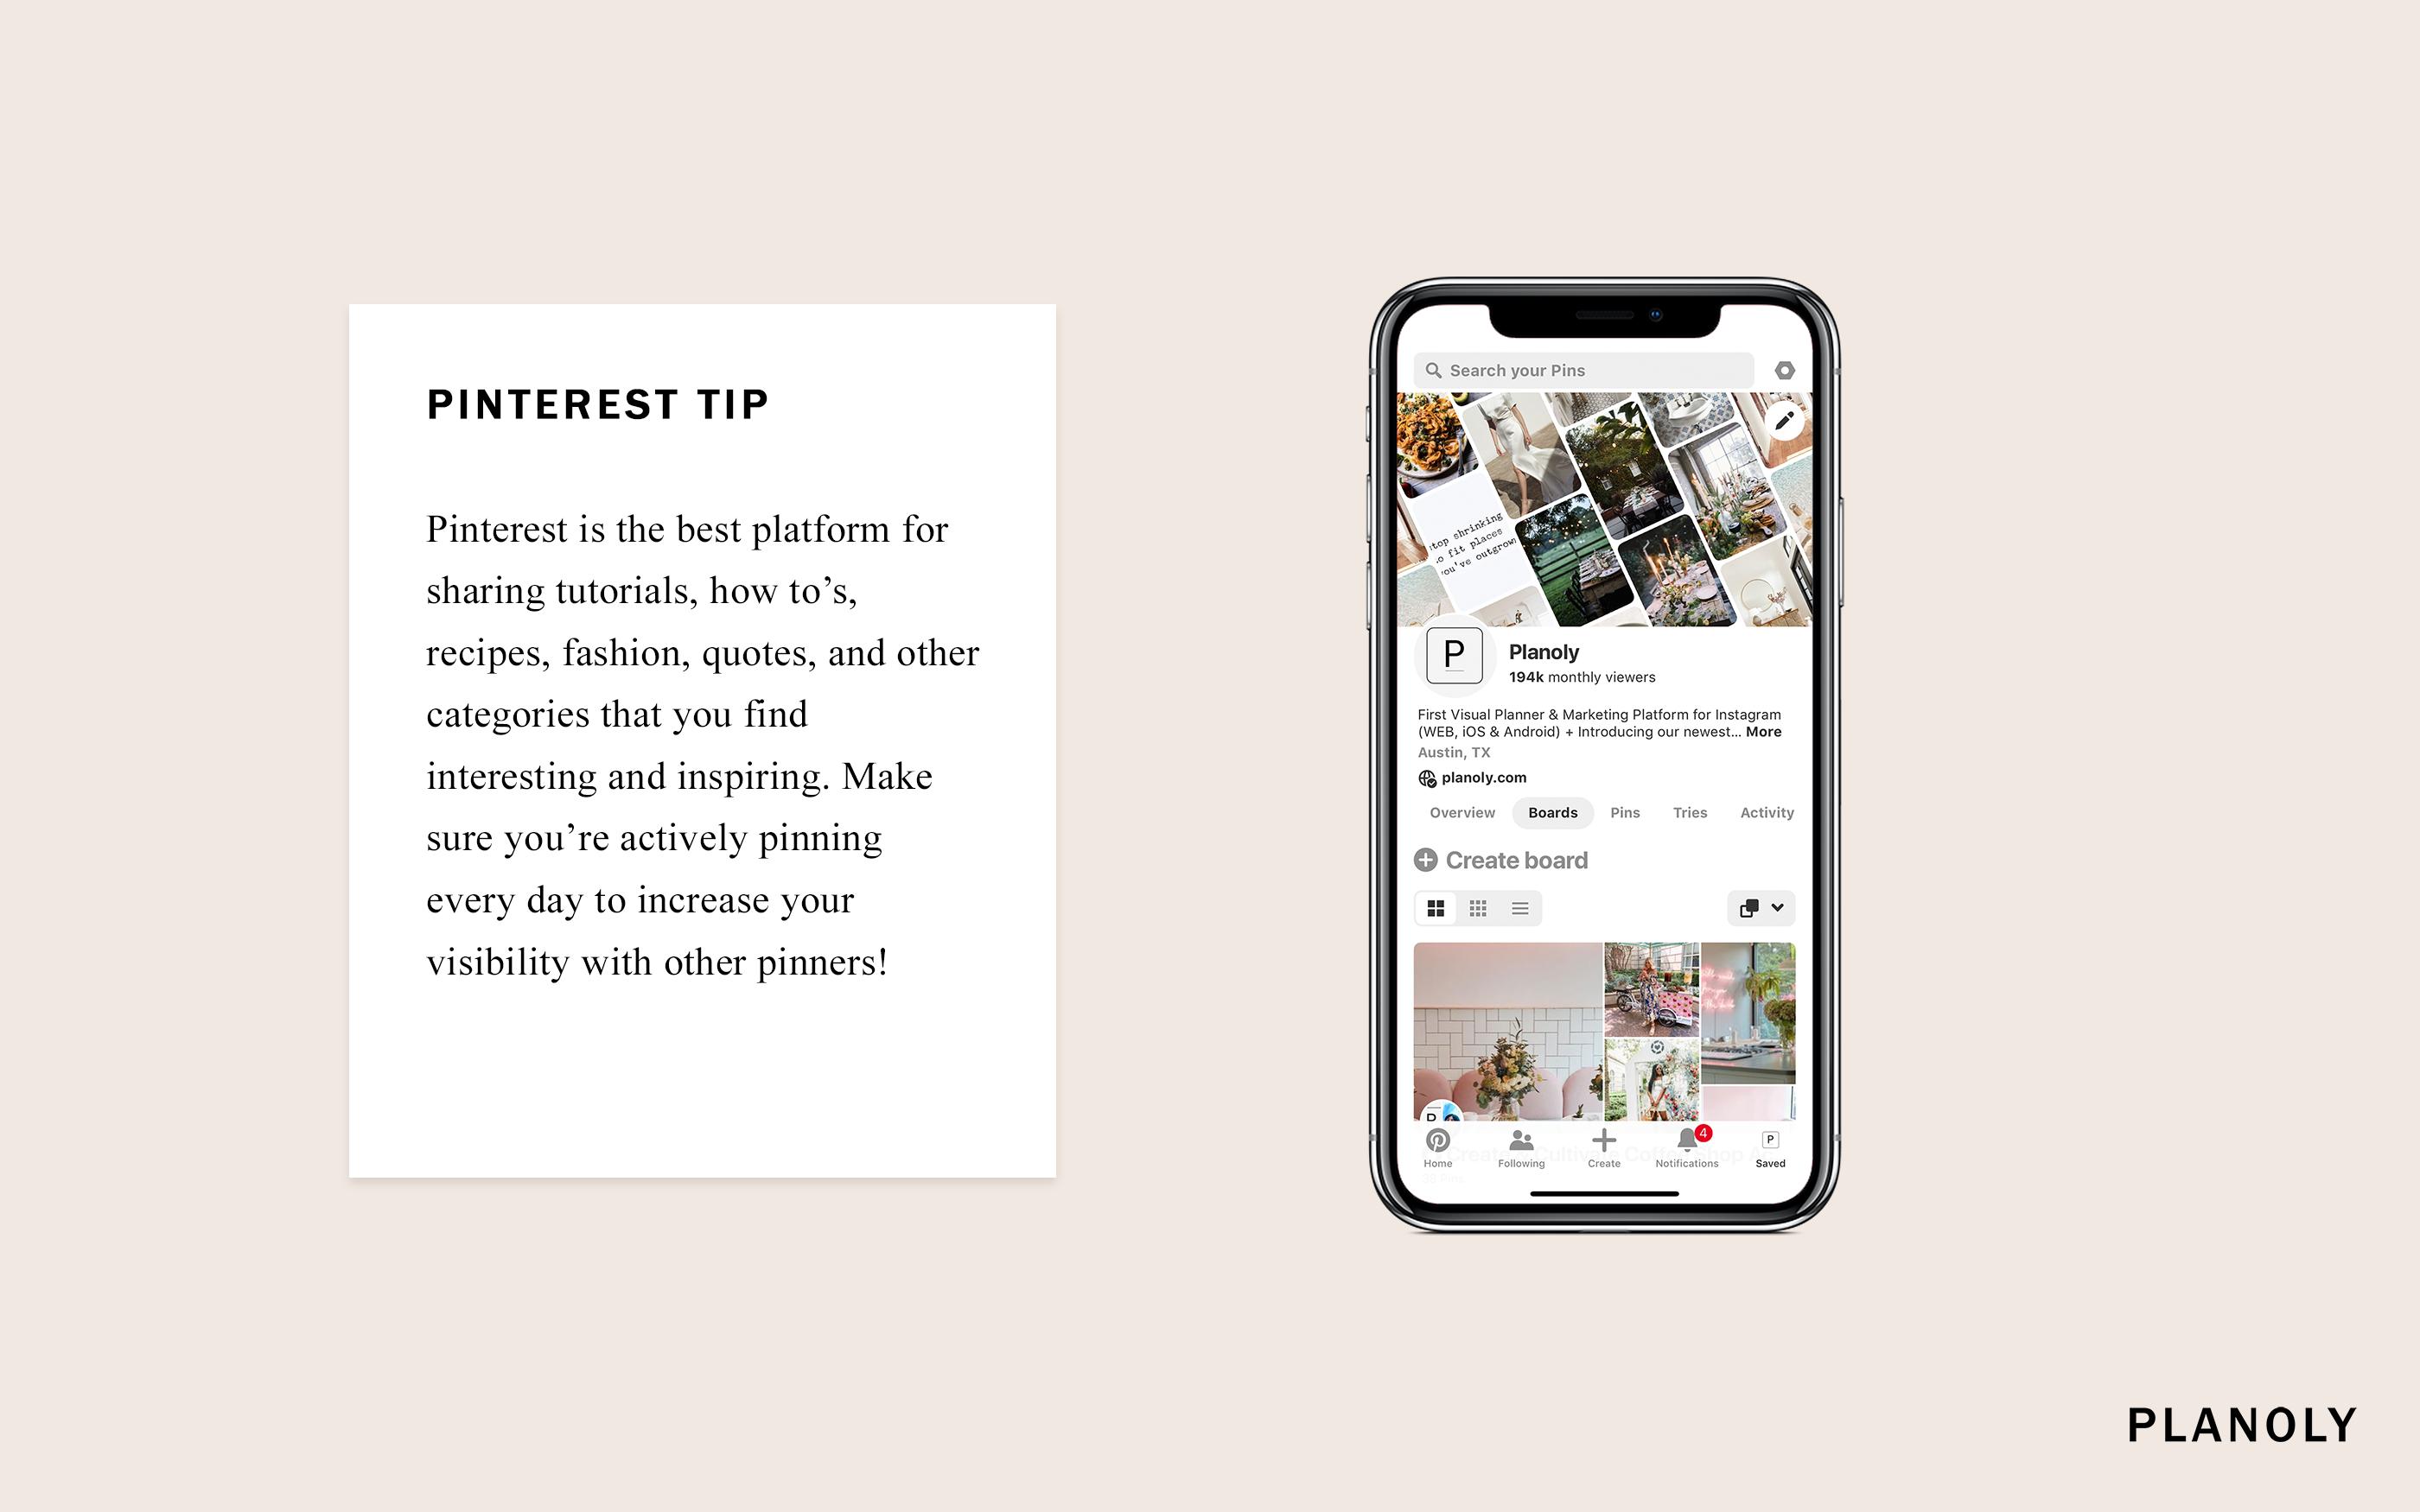 PLANOLY Pinterest Tip